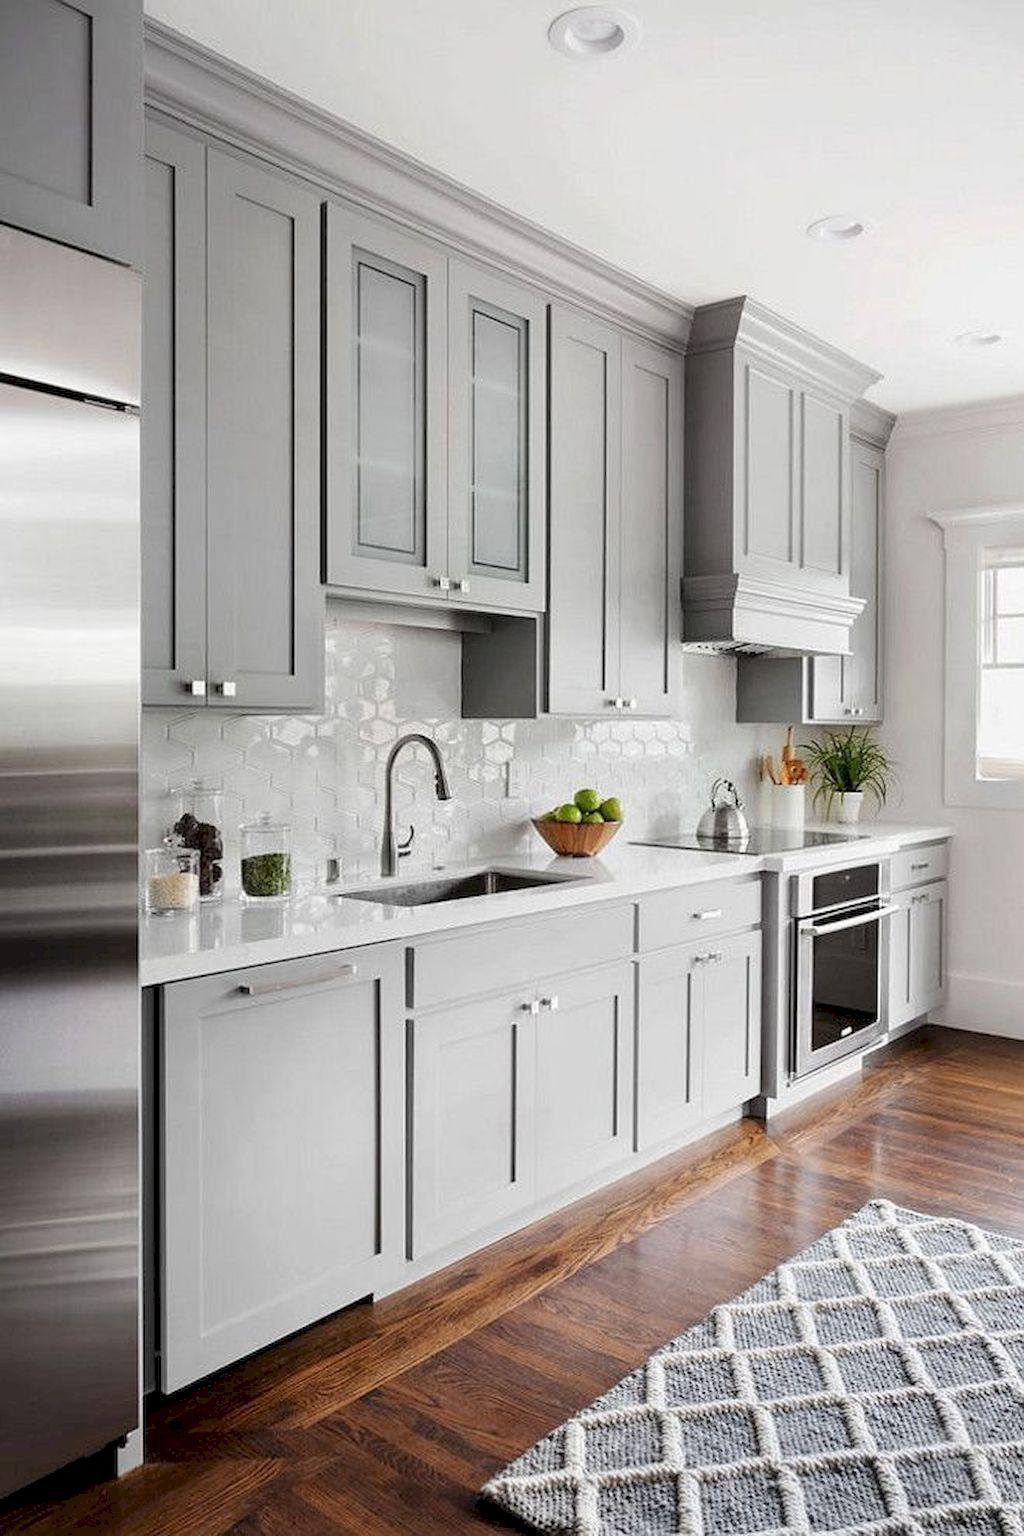 39 incredible farmhouse gray kitchen cabinet design ideas shaker style kitchen cabinets on kitchen ideas gray id=50671